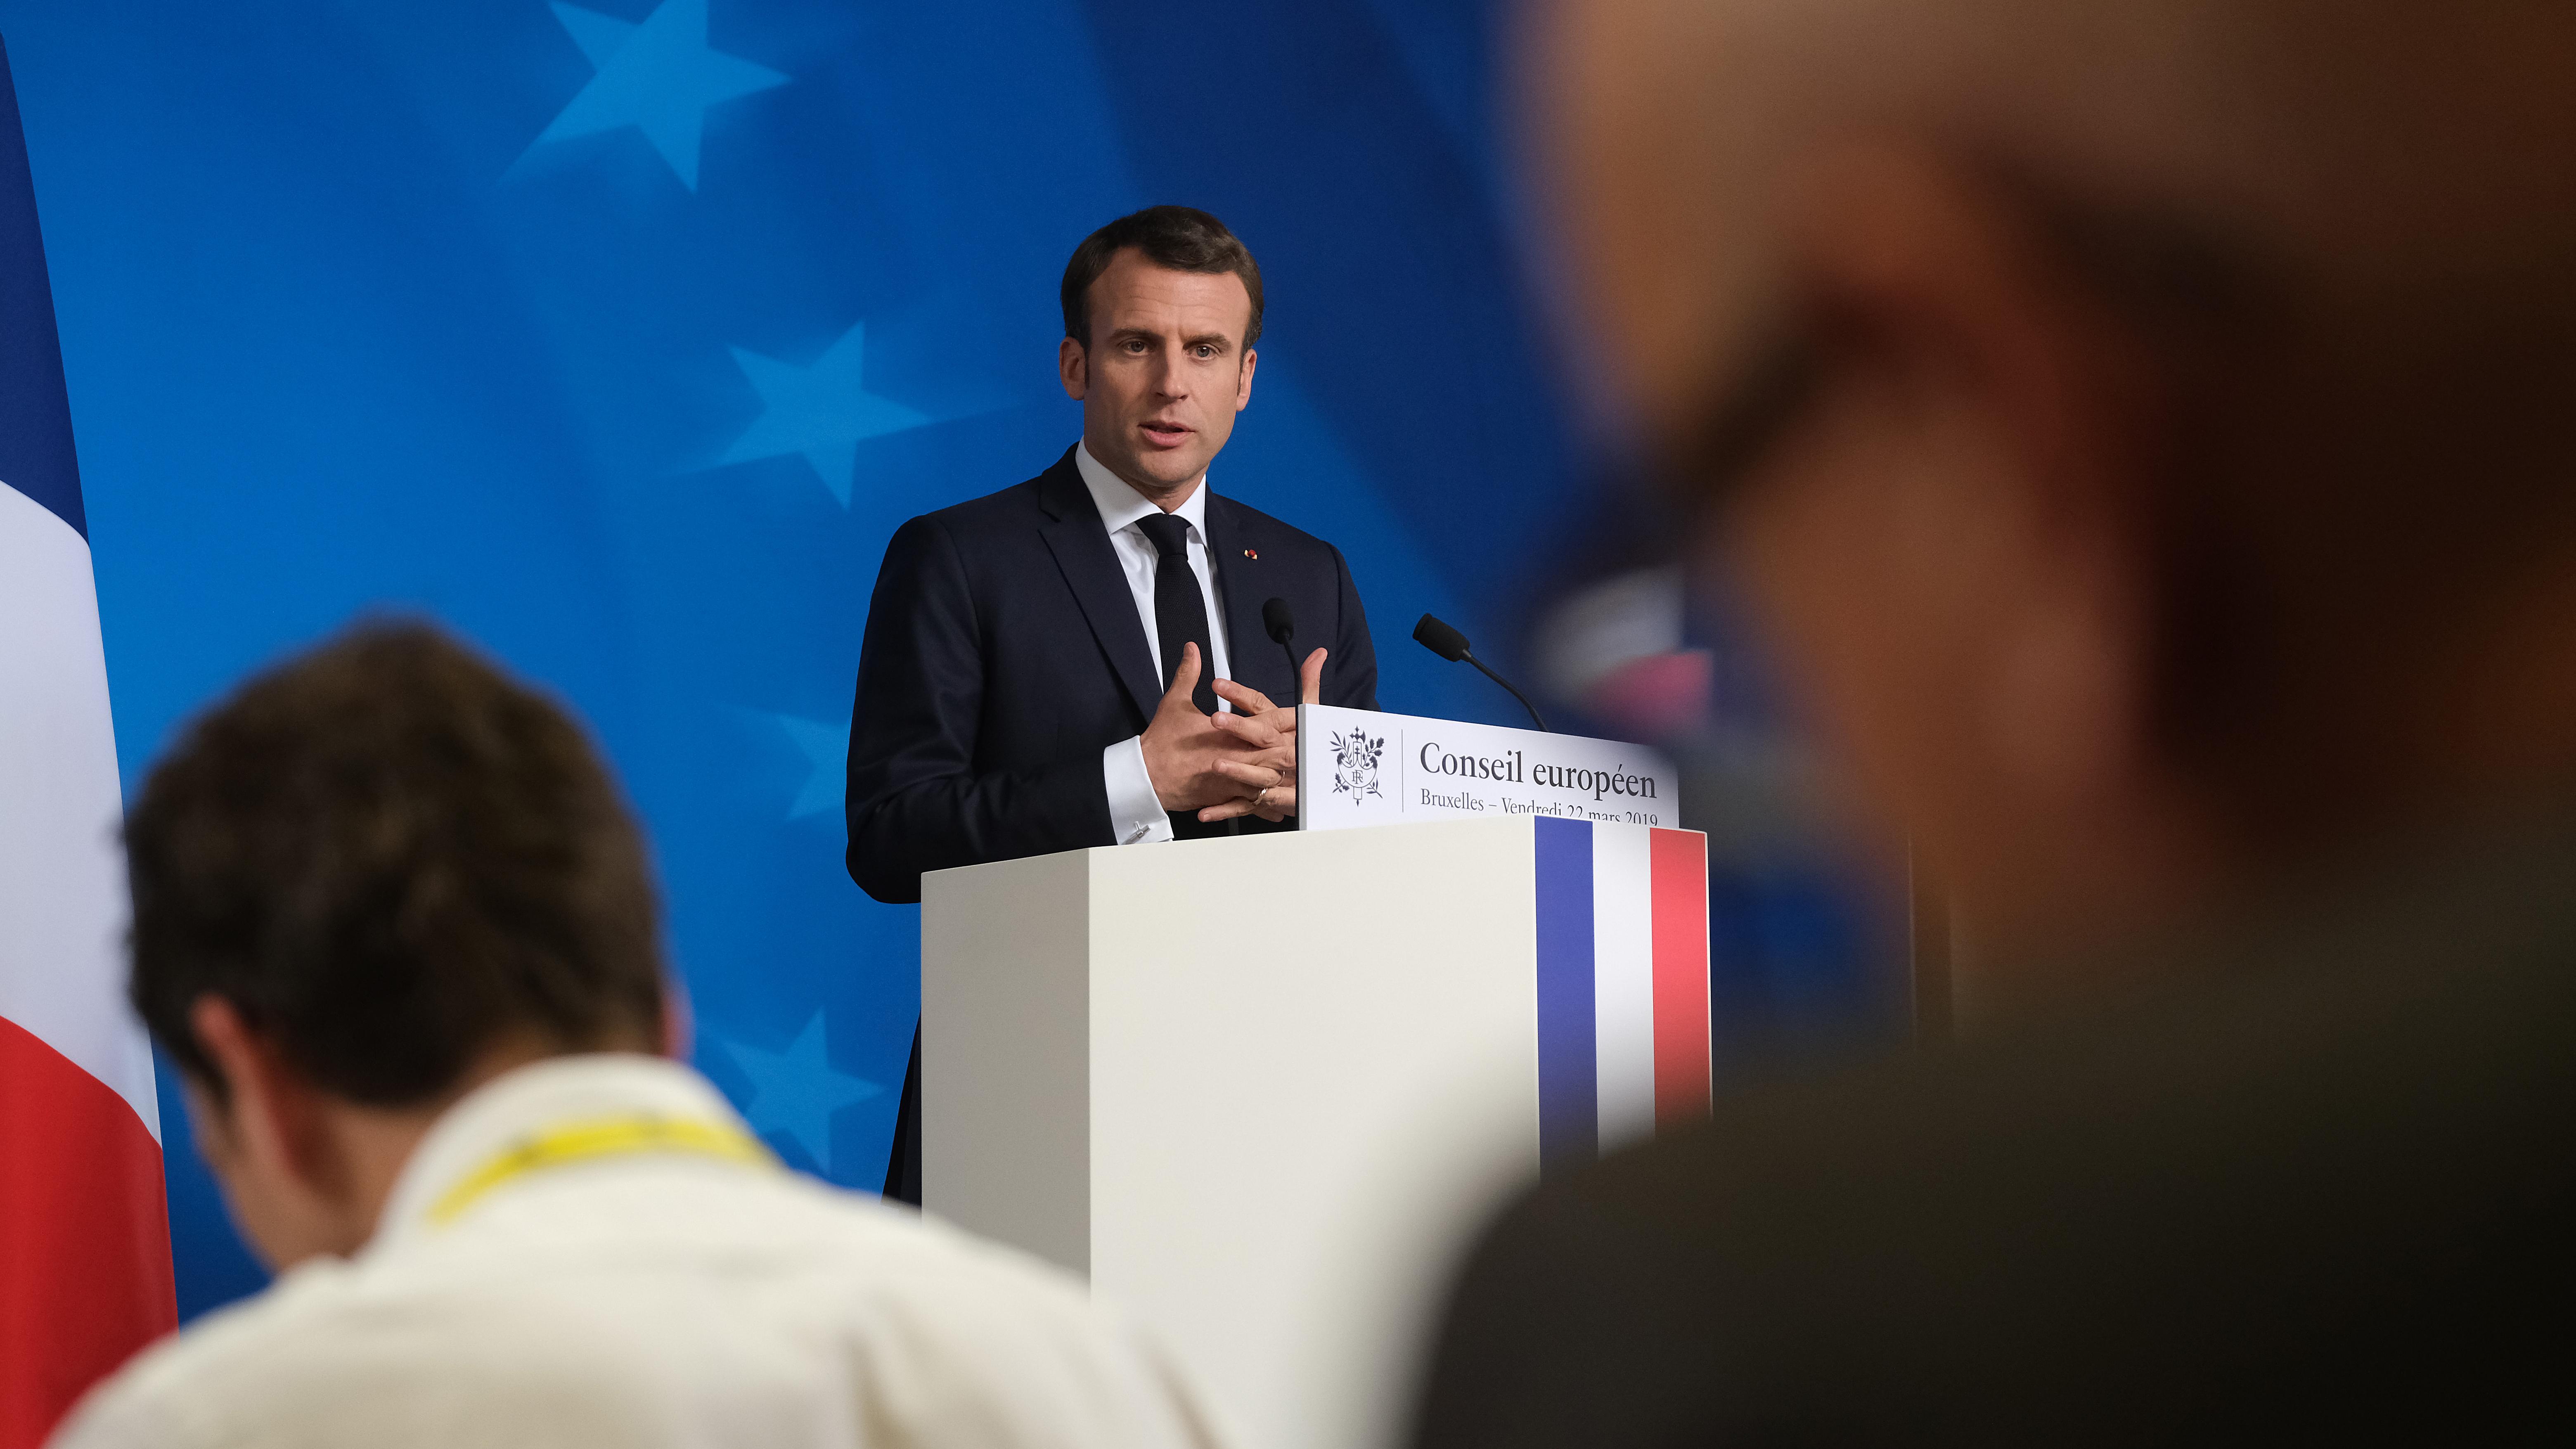 Emmanuel Macron kritisiert Kompromiss mit Fidesz-Partei